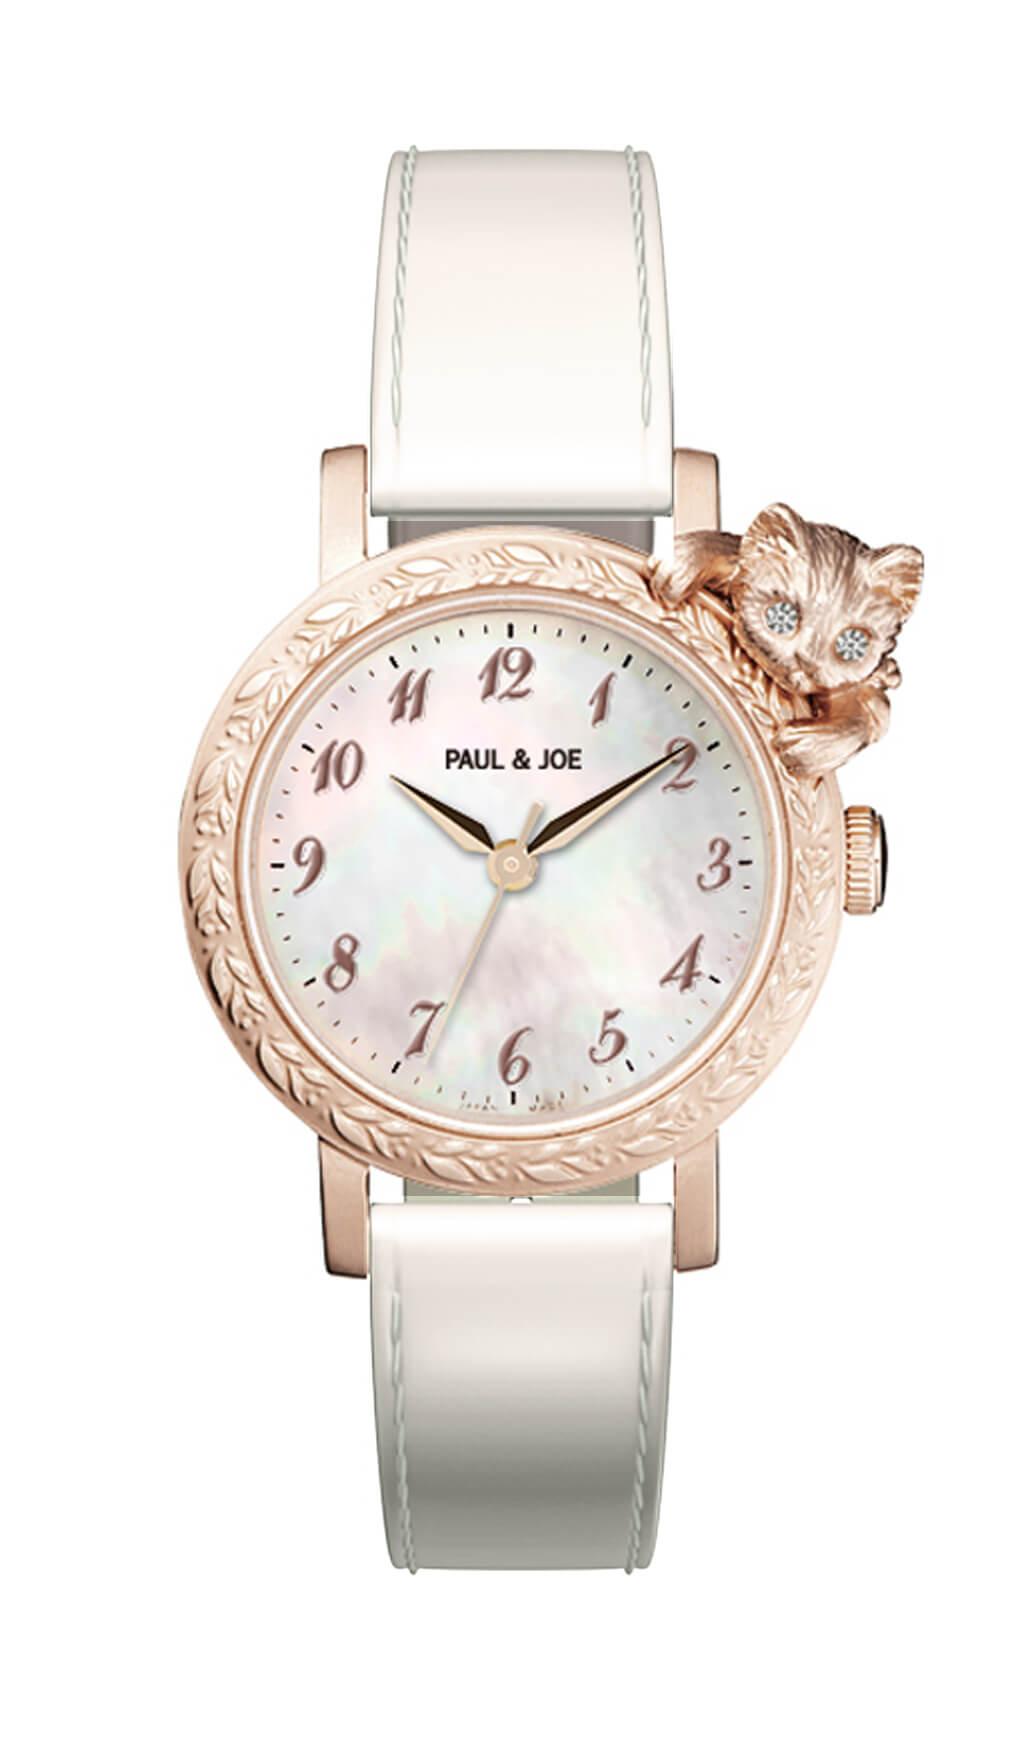 Timeless Cat (タイムレスキャット)の新作腕時計ピンクゴールド by PAUL & JOE(ポールアンドジョー)